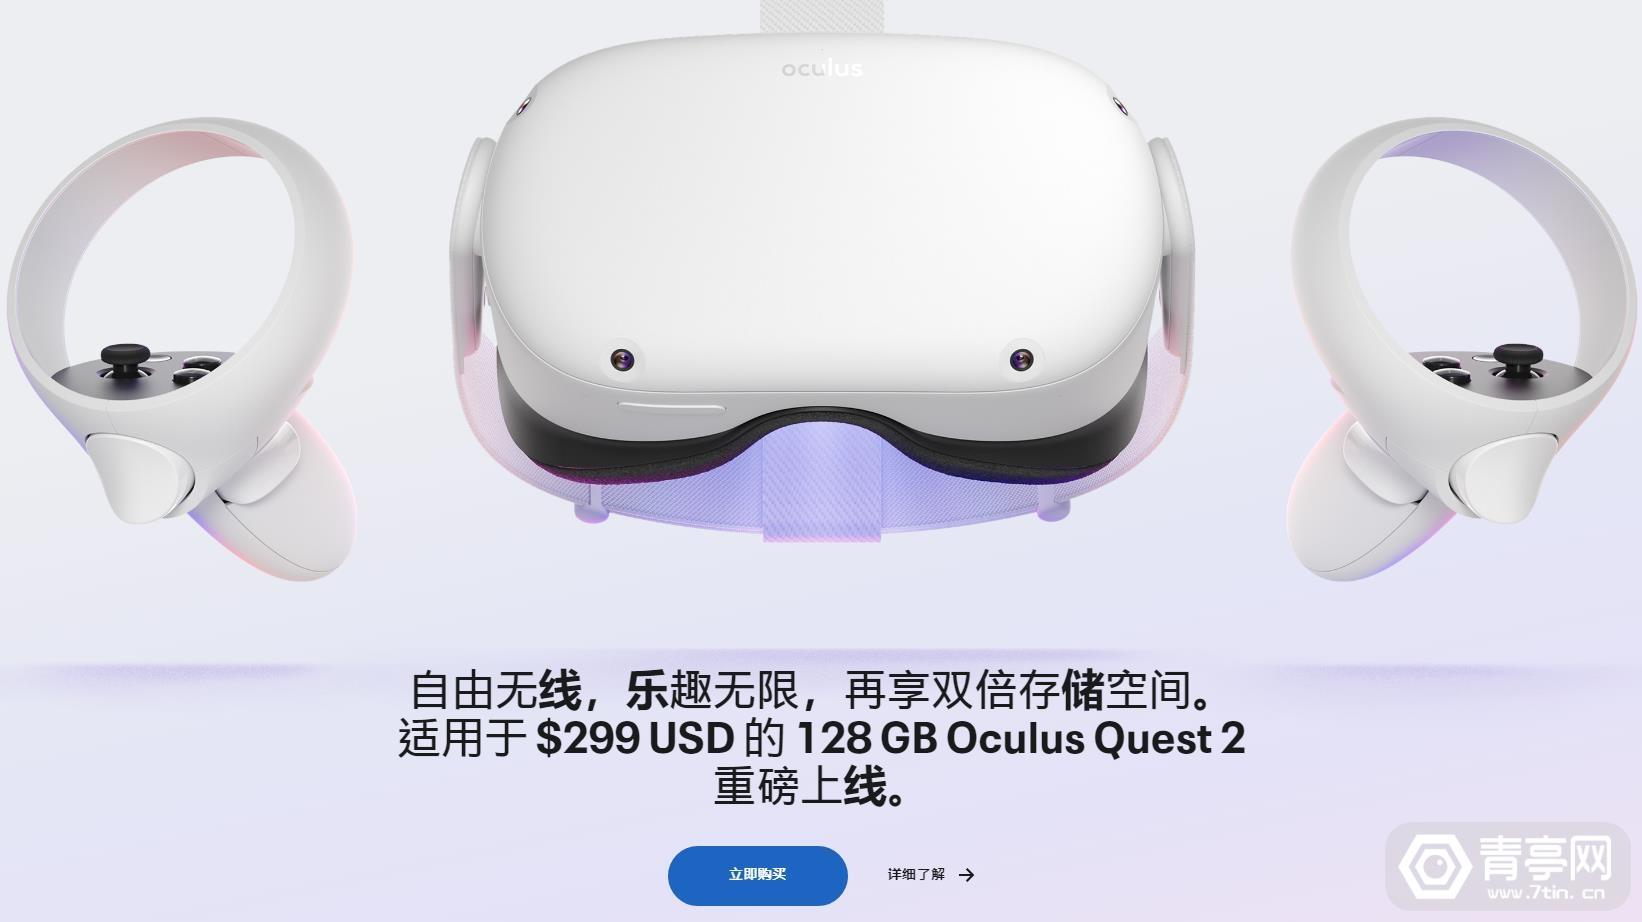 128GB版Oculus Quest 2正式开售,加量不加价